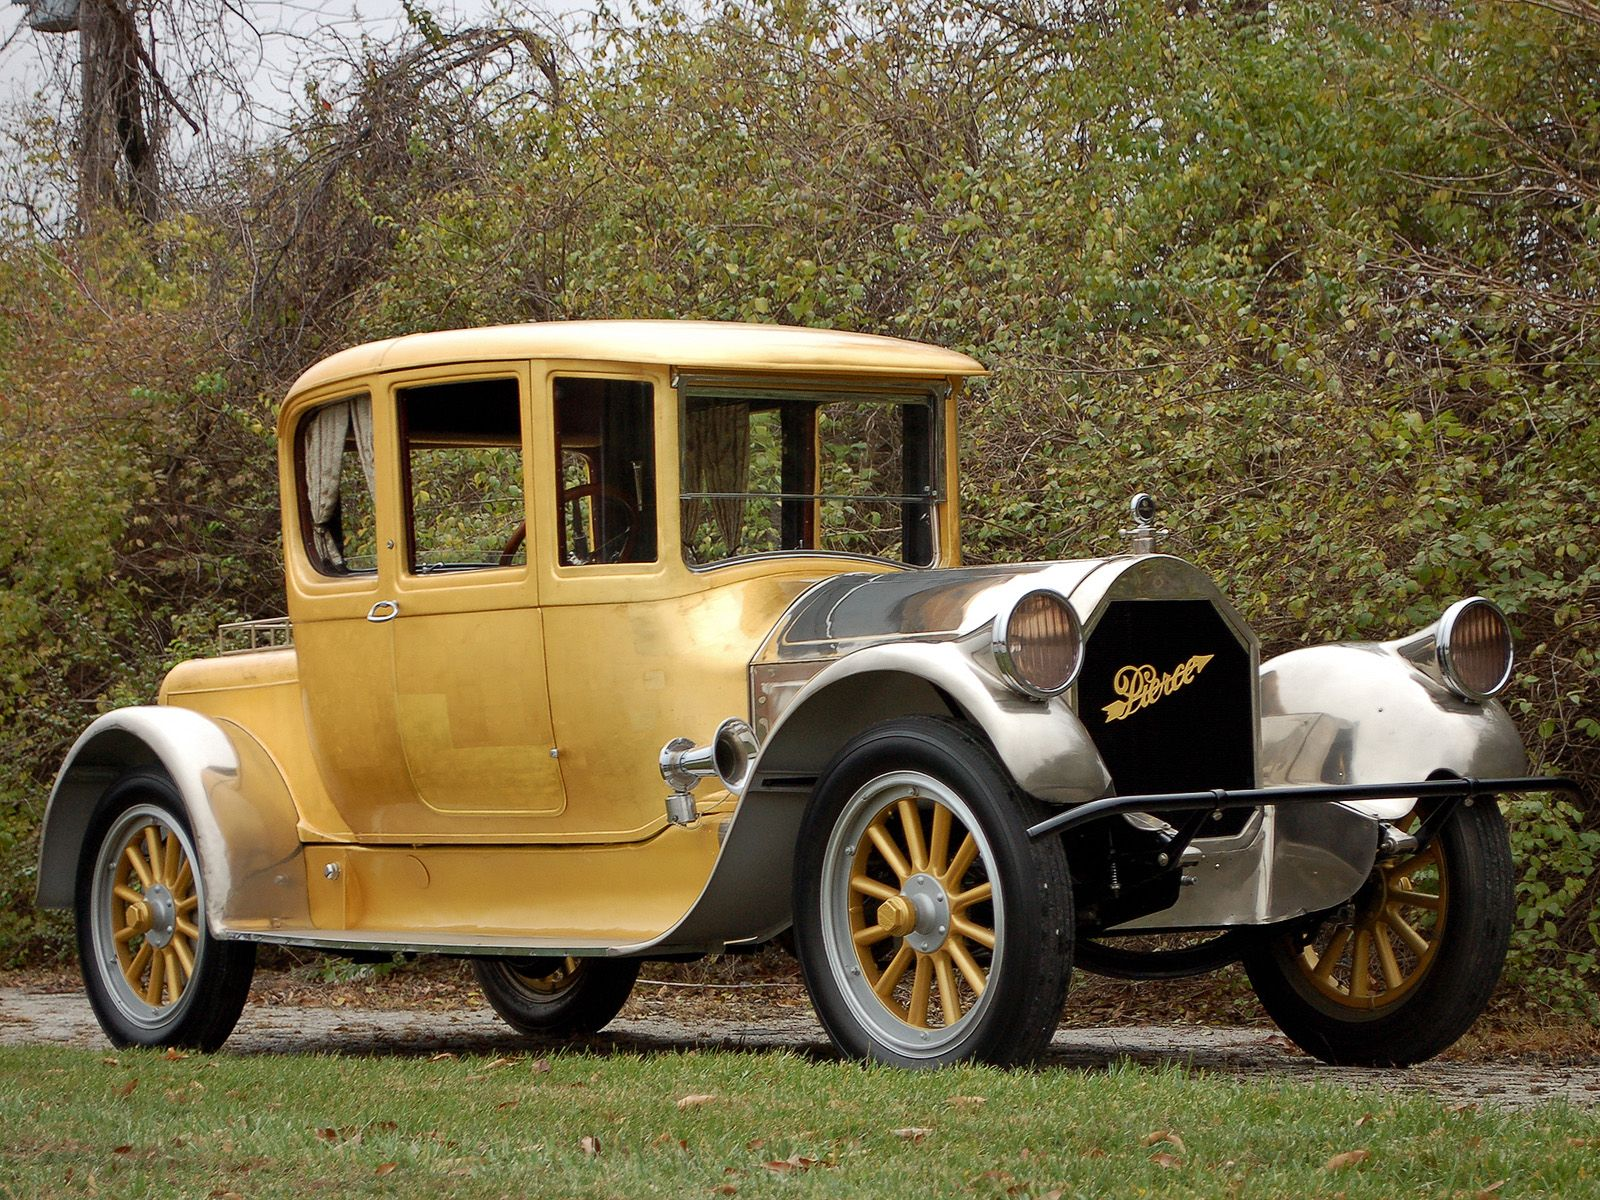 1921 stutz model k bulldog 4 passenger tourer autos antiqu simos pinterest models cars and wheels